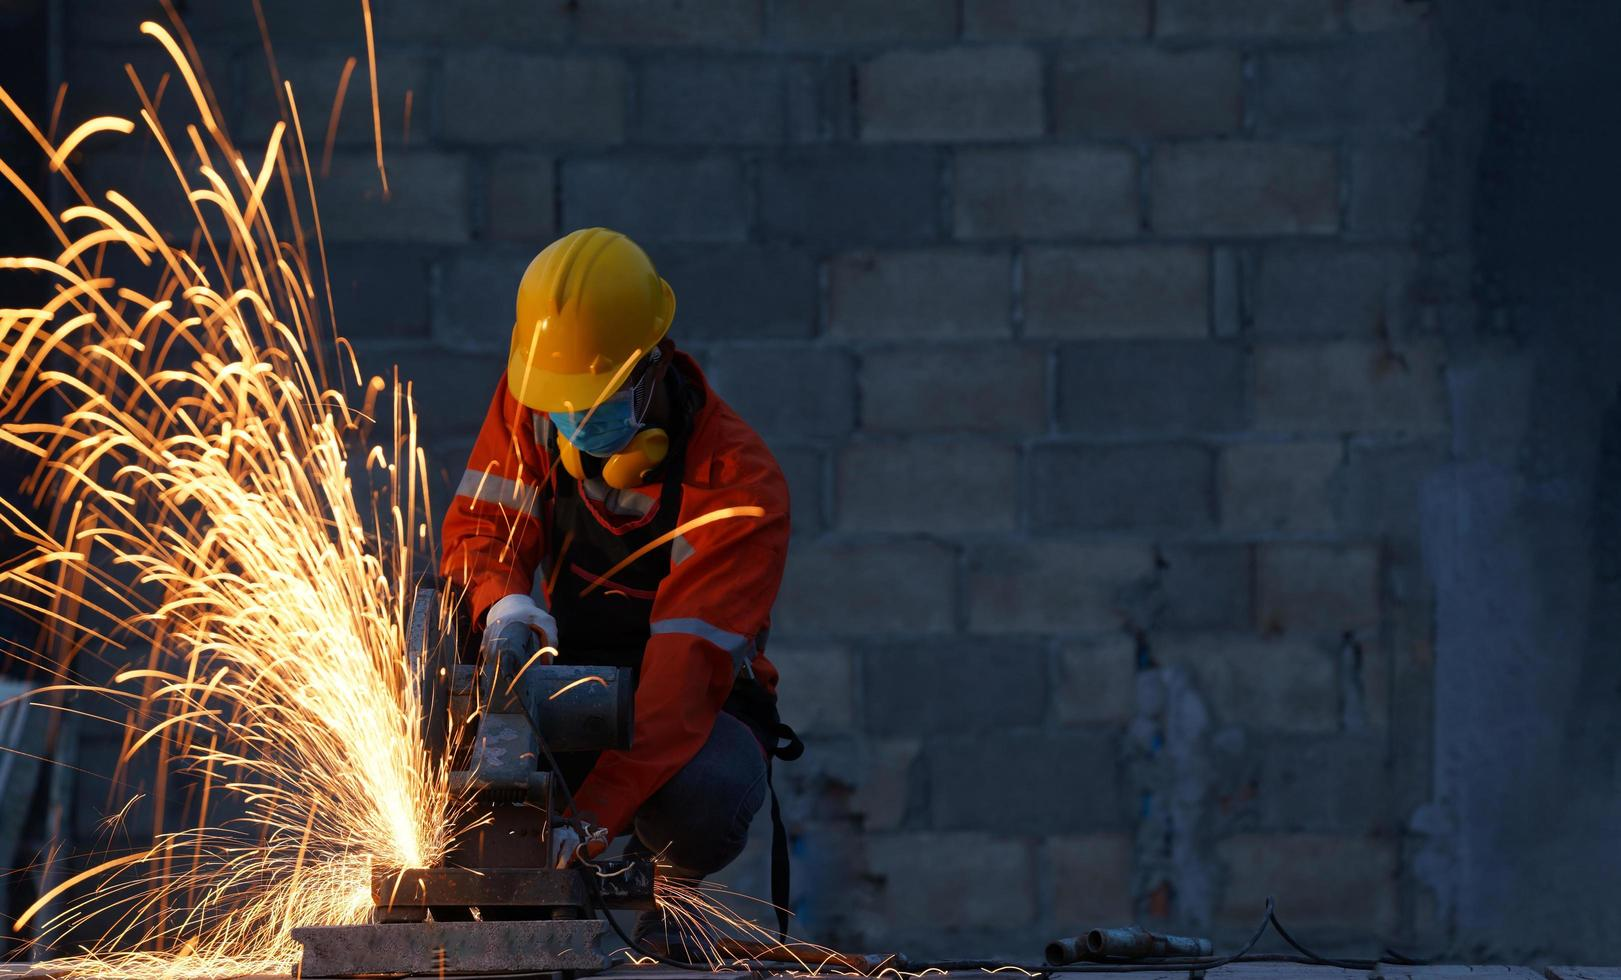 werknemer met beschermend masker ter bescherming tegen. foto